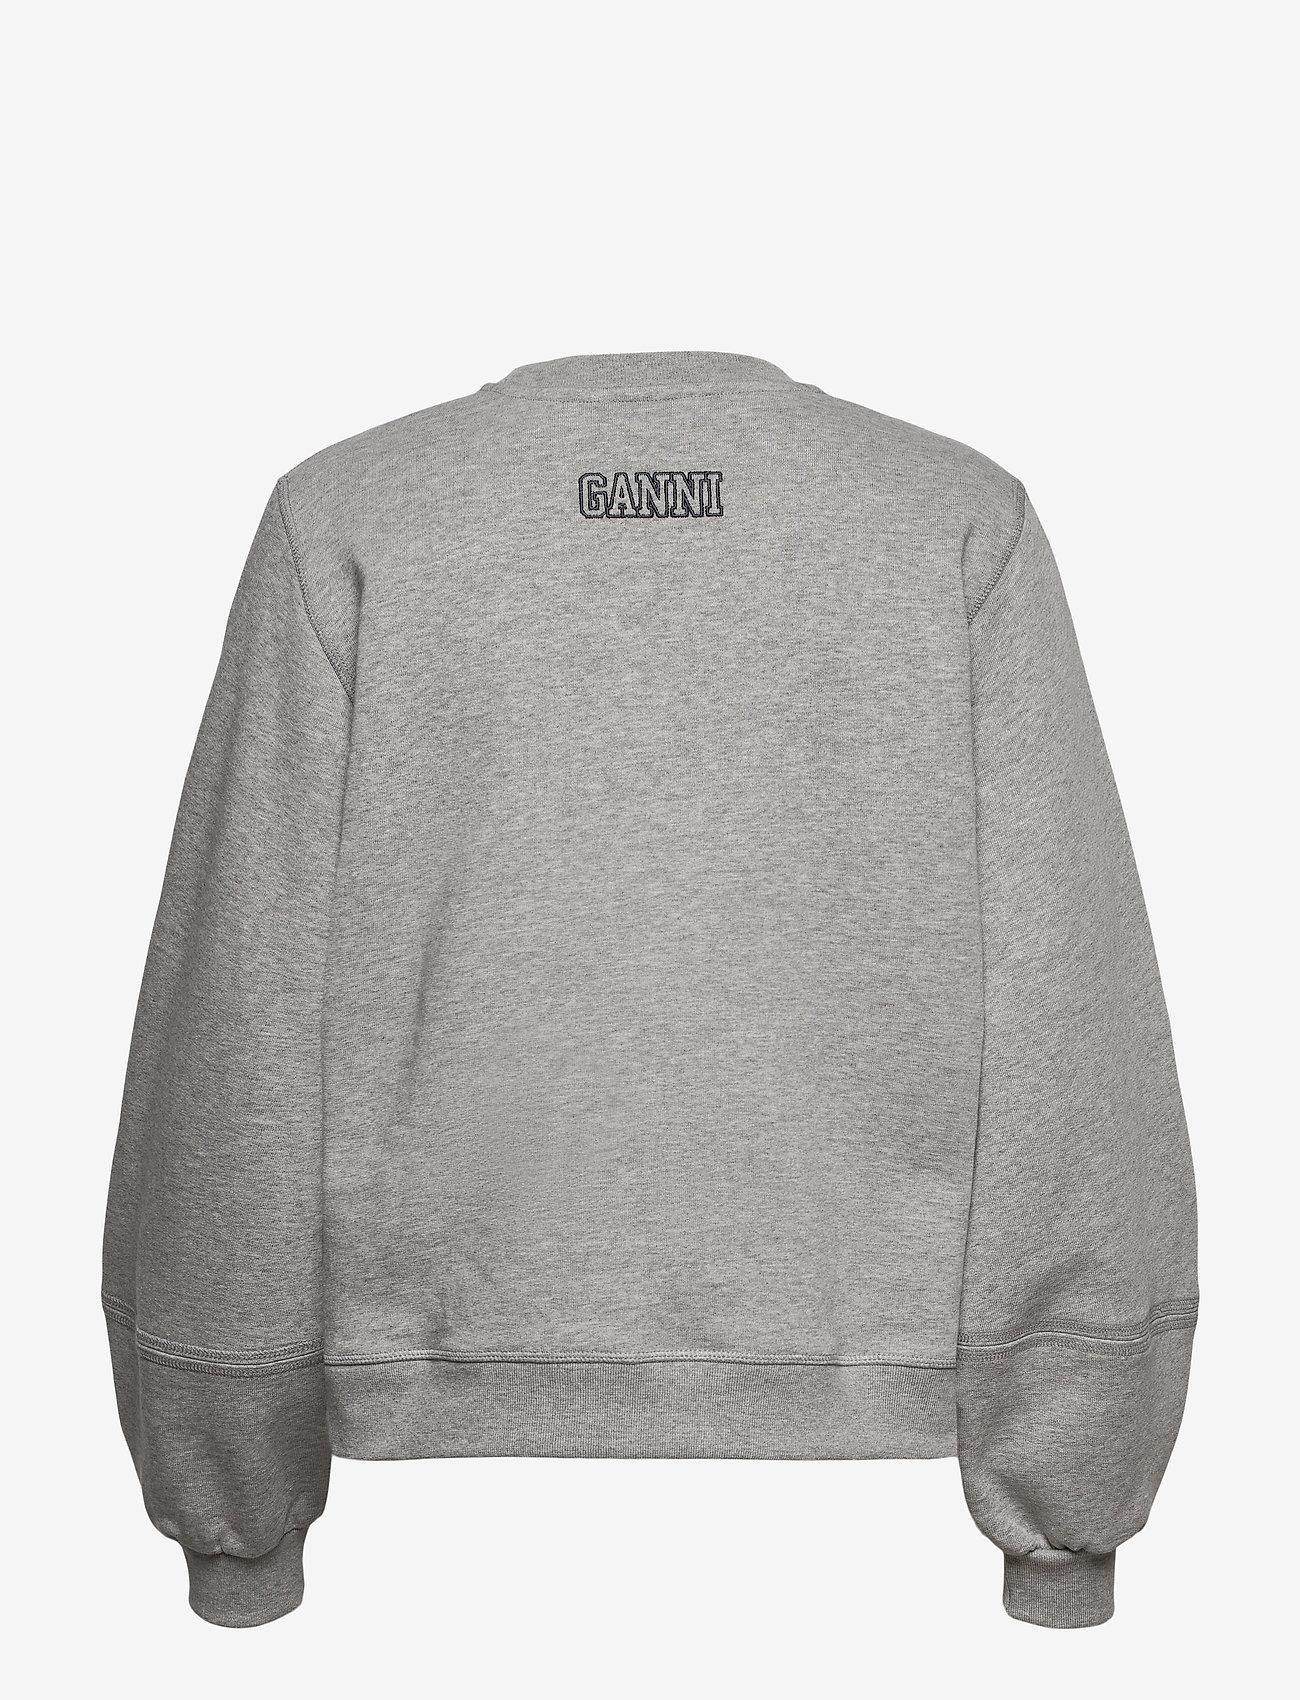 Ganni - Software Isoli - sweatshirts & hoodies - paloma melange - 1